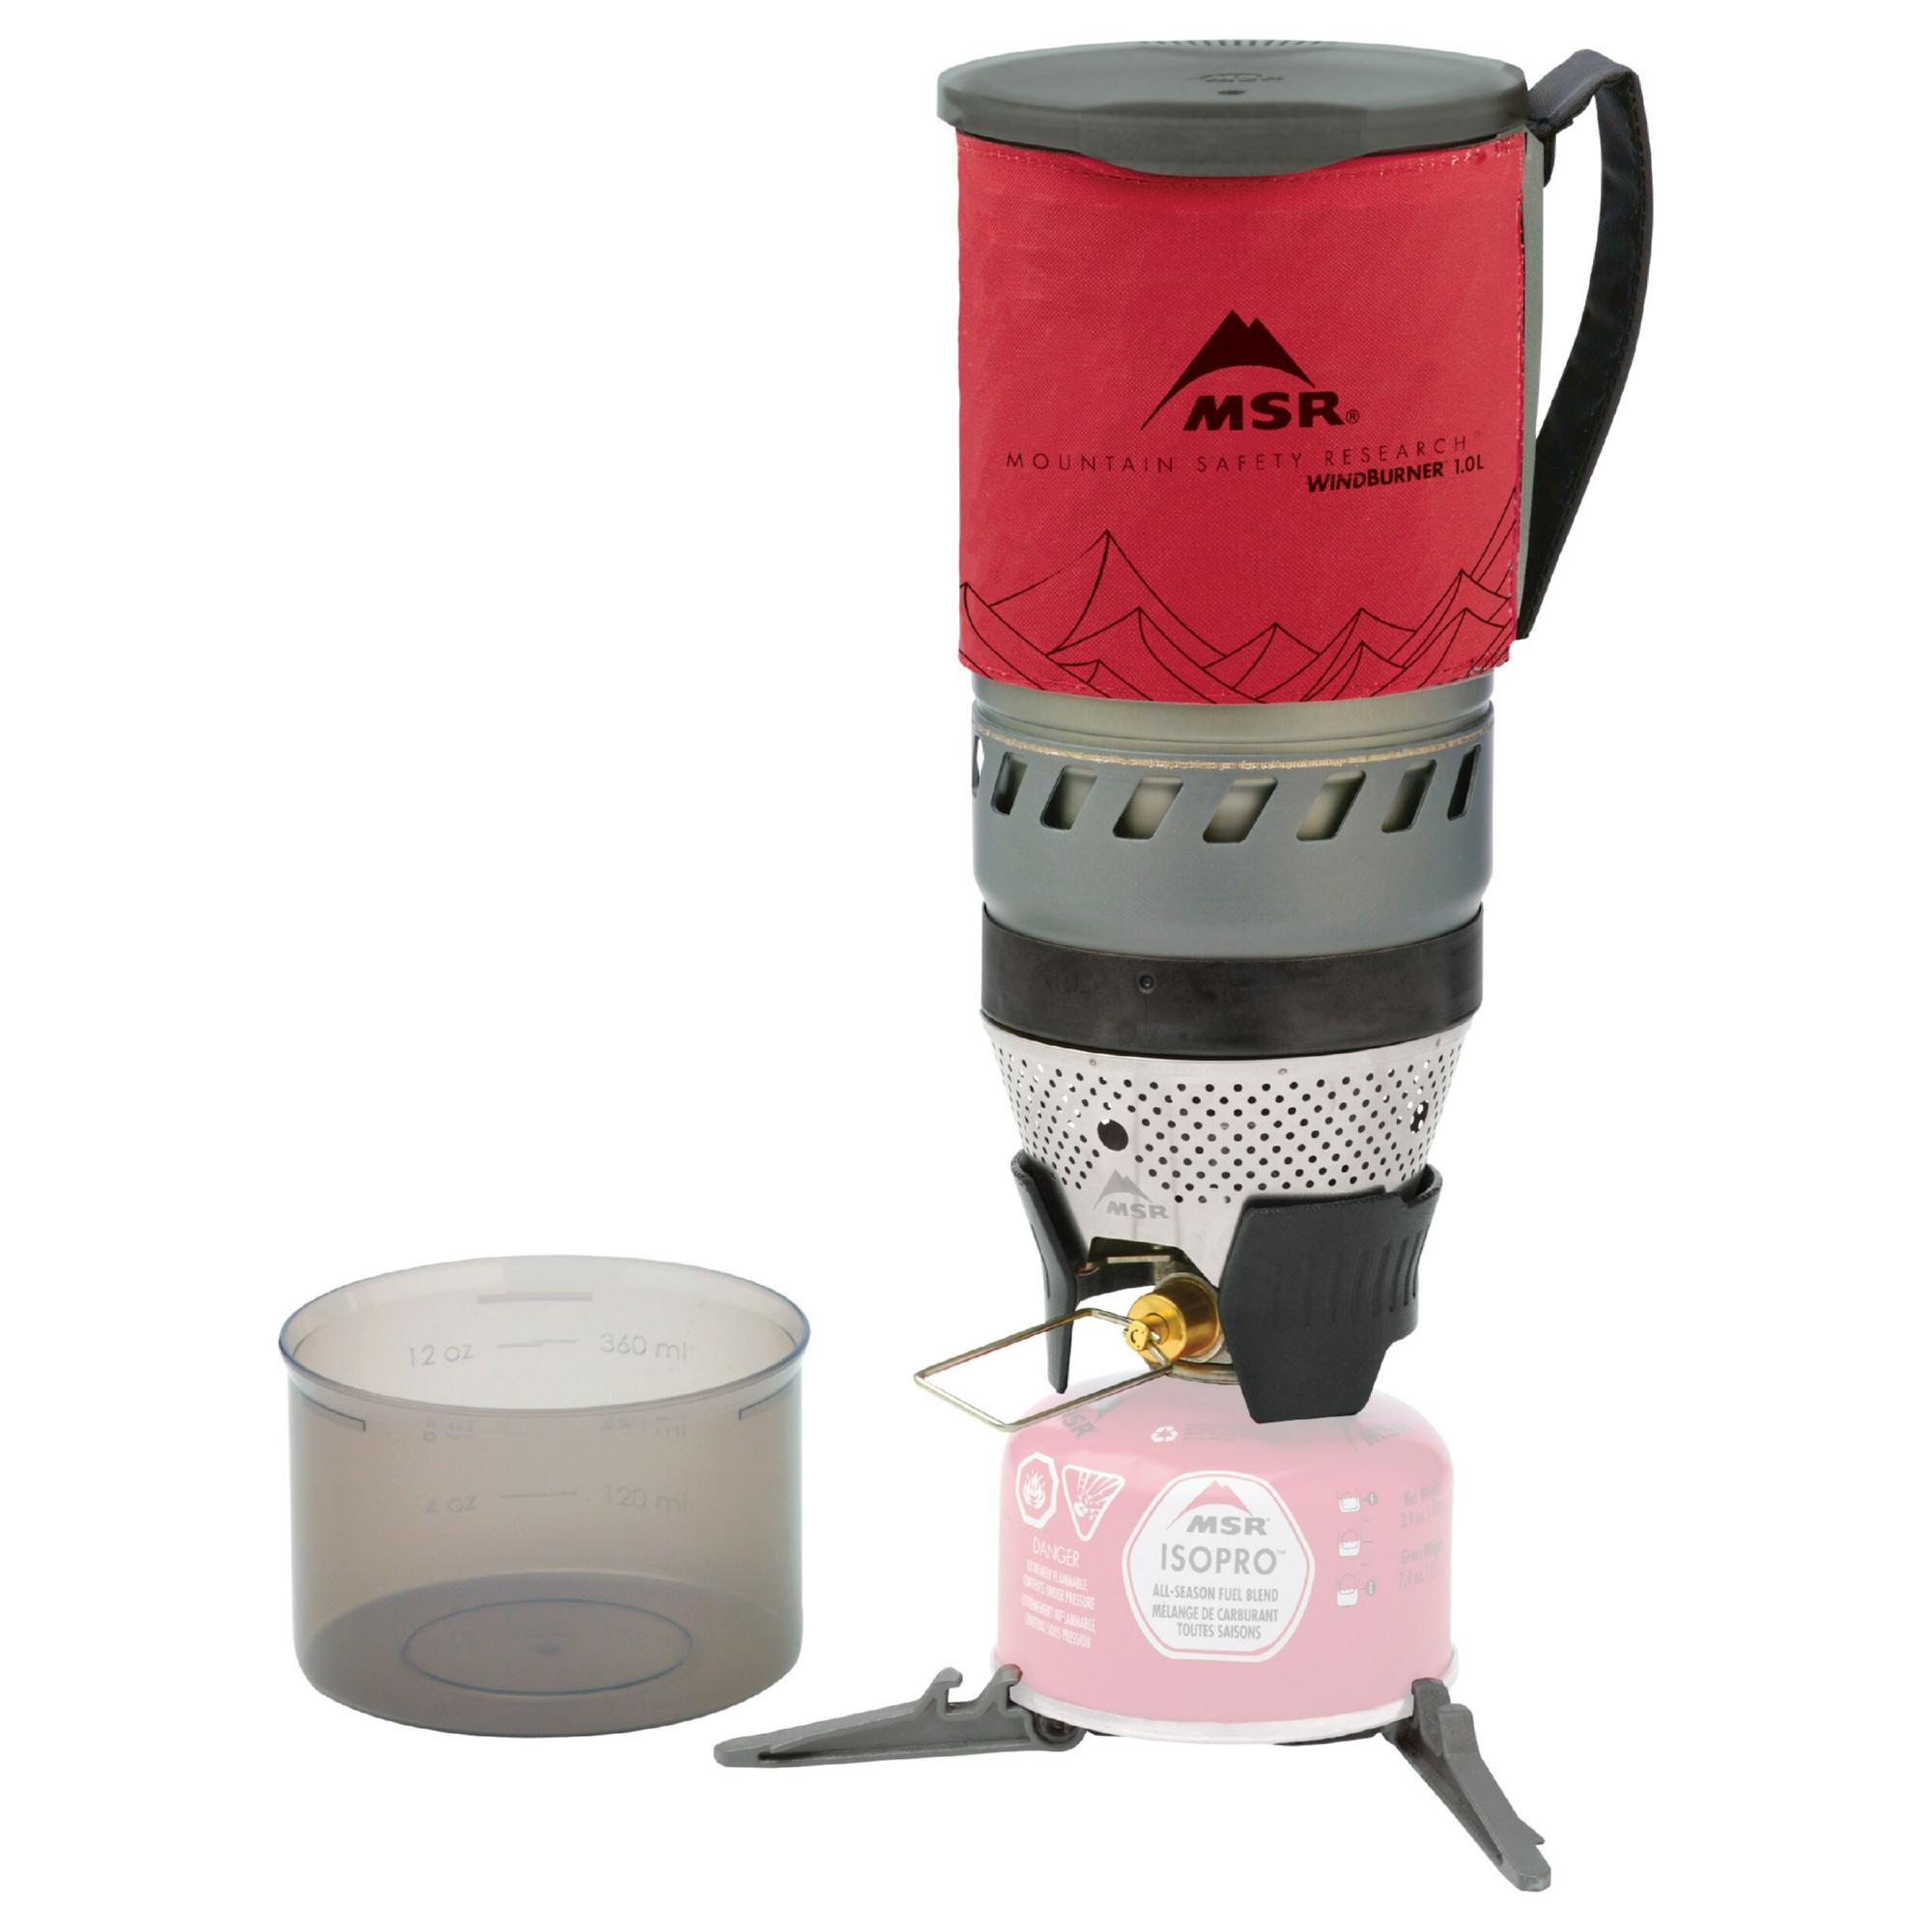 Windburner 1.0 L Stove System